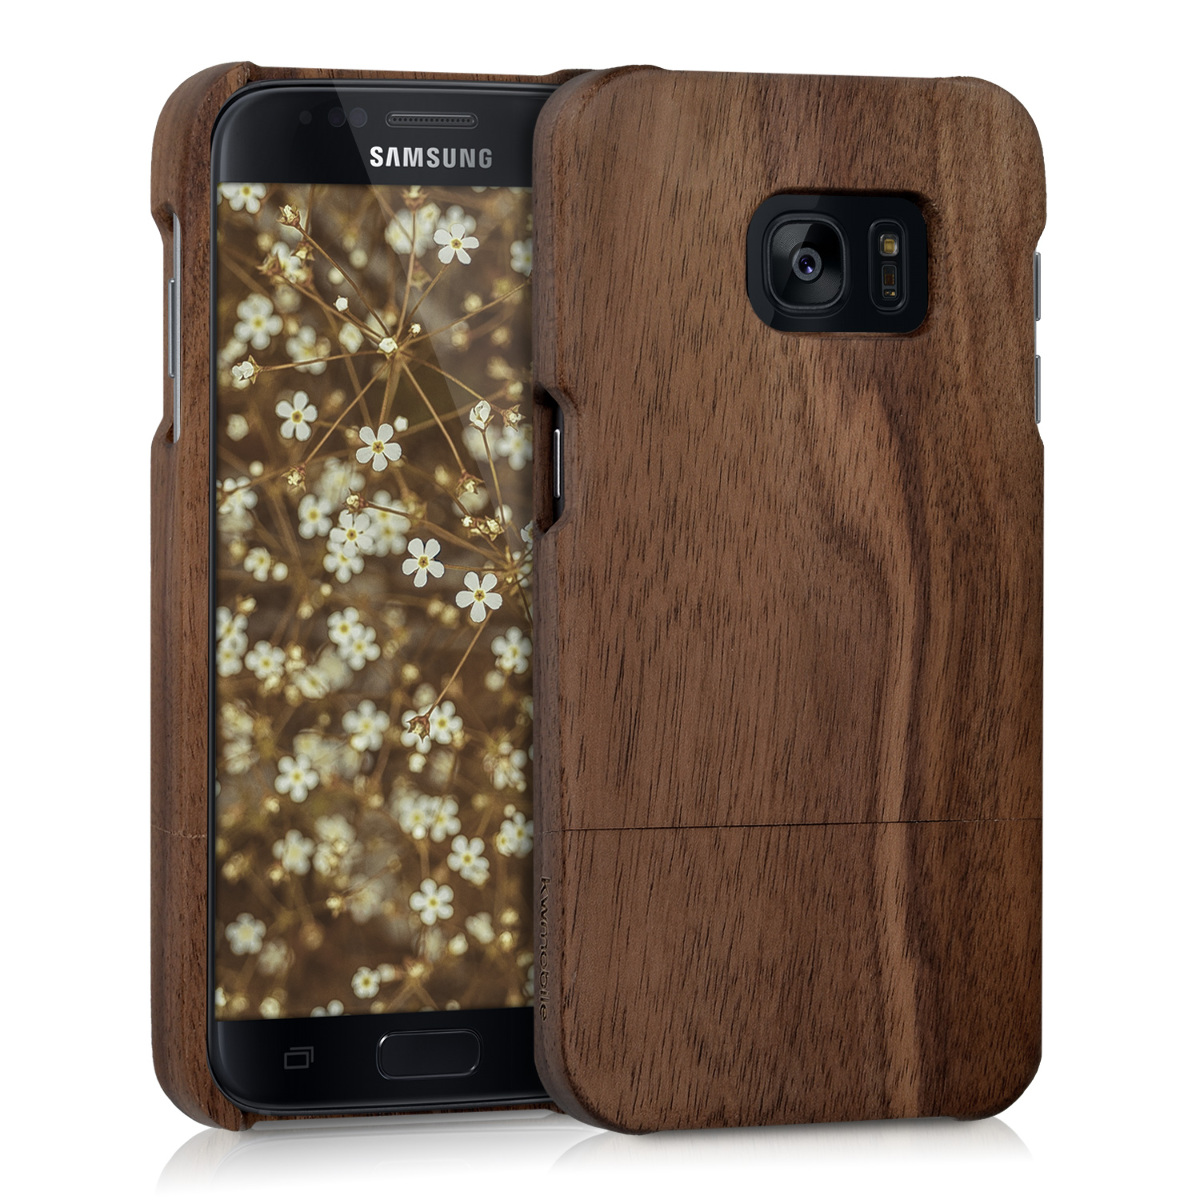 KW Ξύλινη Θήκη Samsung Galaxy S7 - Καφέ(37138.05)